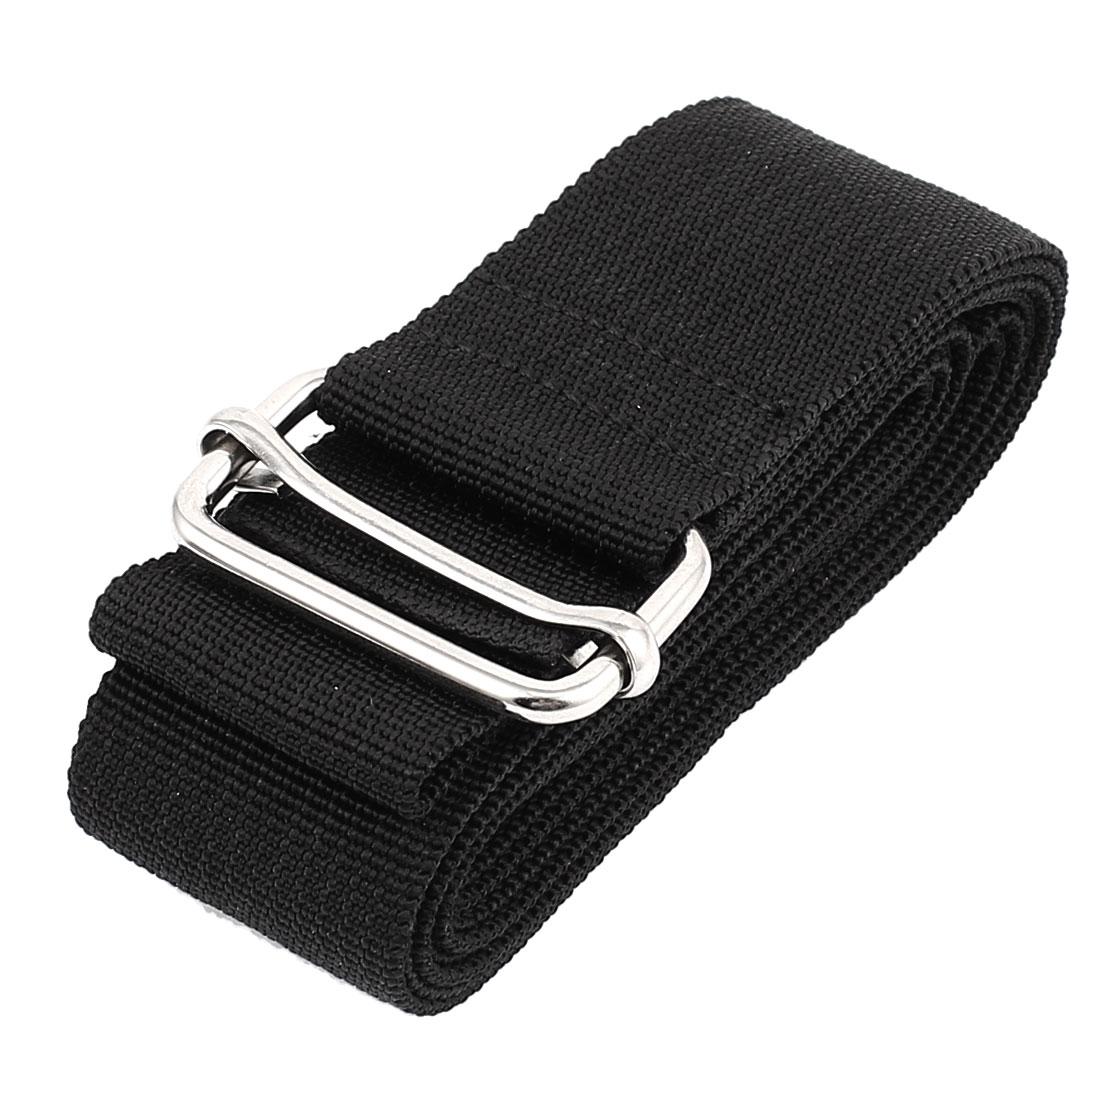 Outdoor Travel Metal Buckle Adjustable Luggage Suitcase Backpack Strap Belt 2M Length 38mm Width